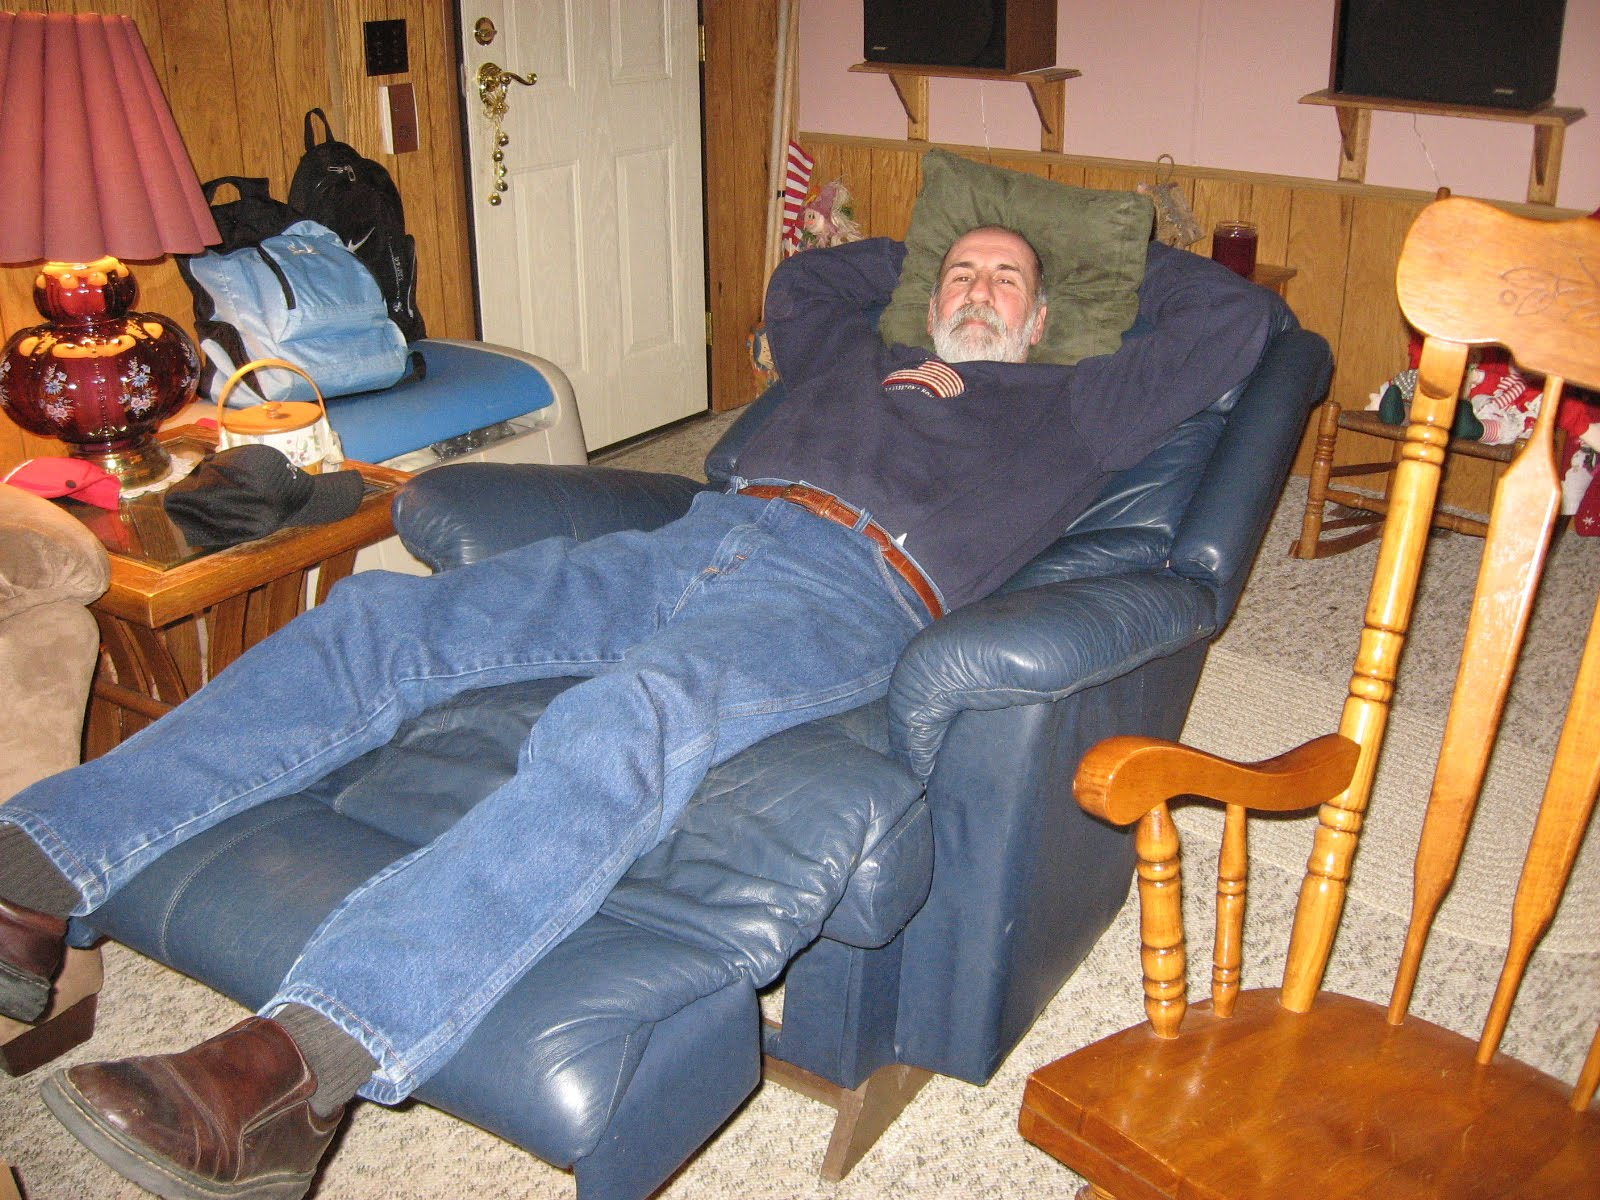 Genial Tucked In Sweatshirt Relaxing Dad.